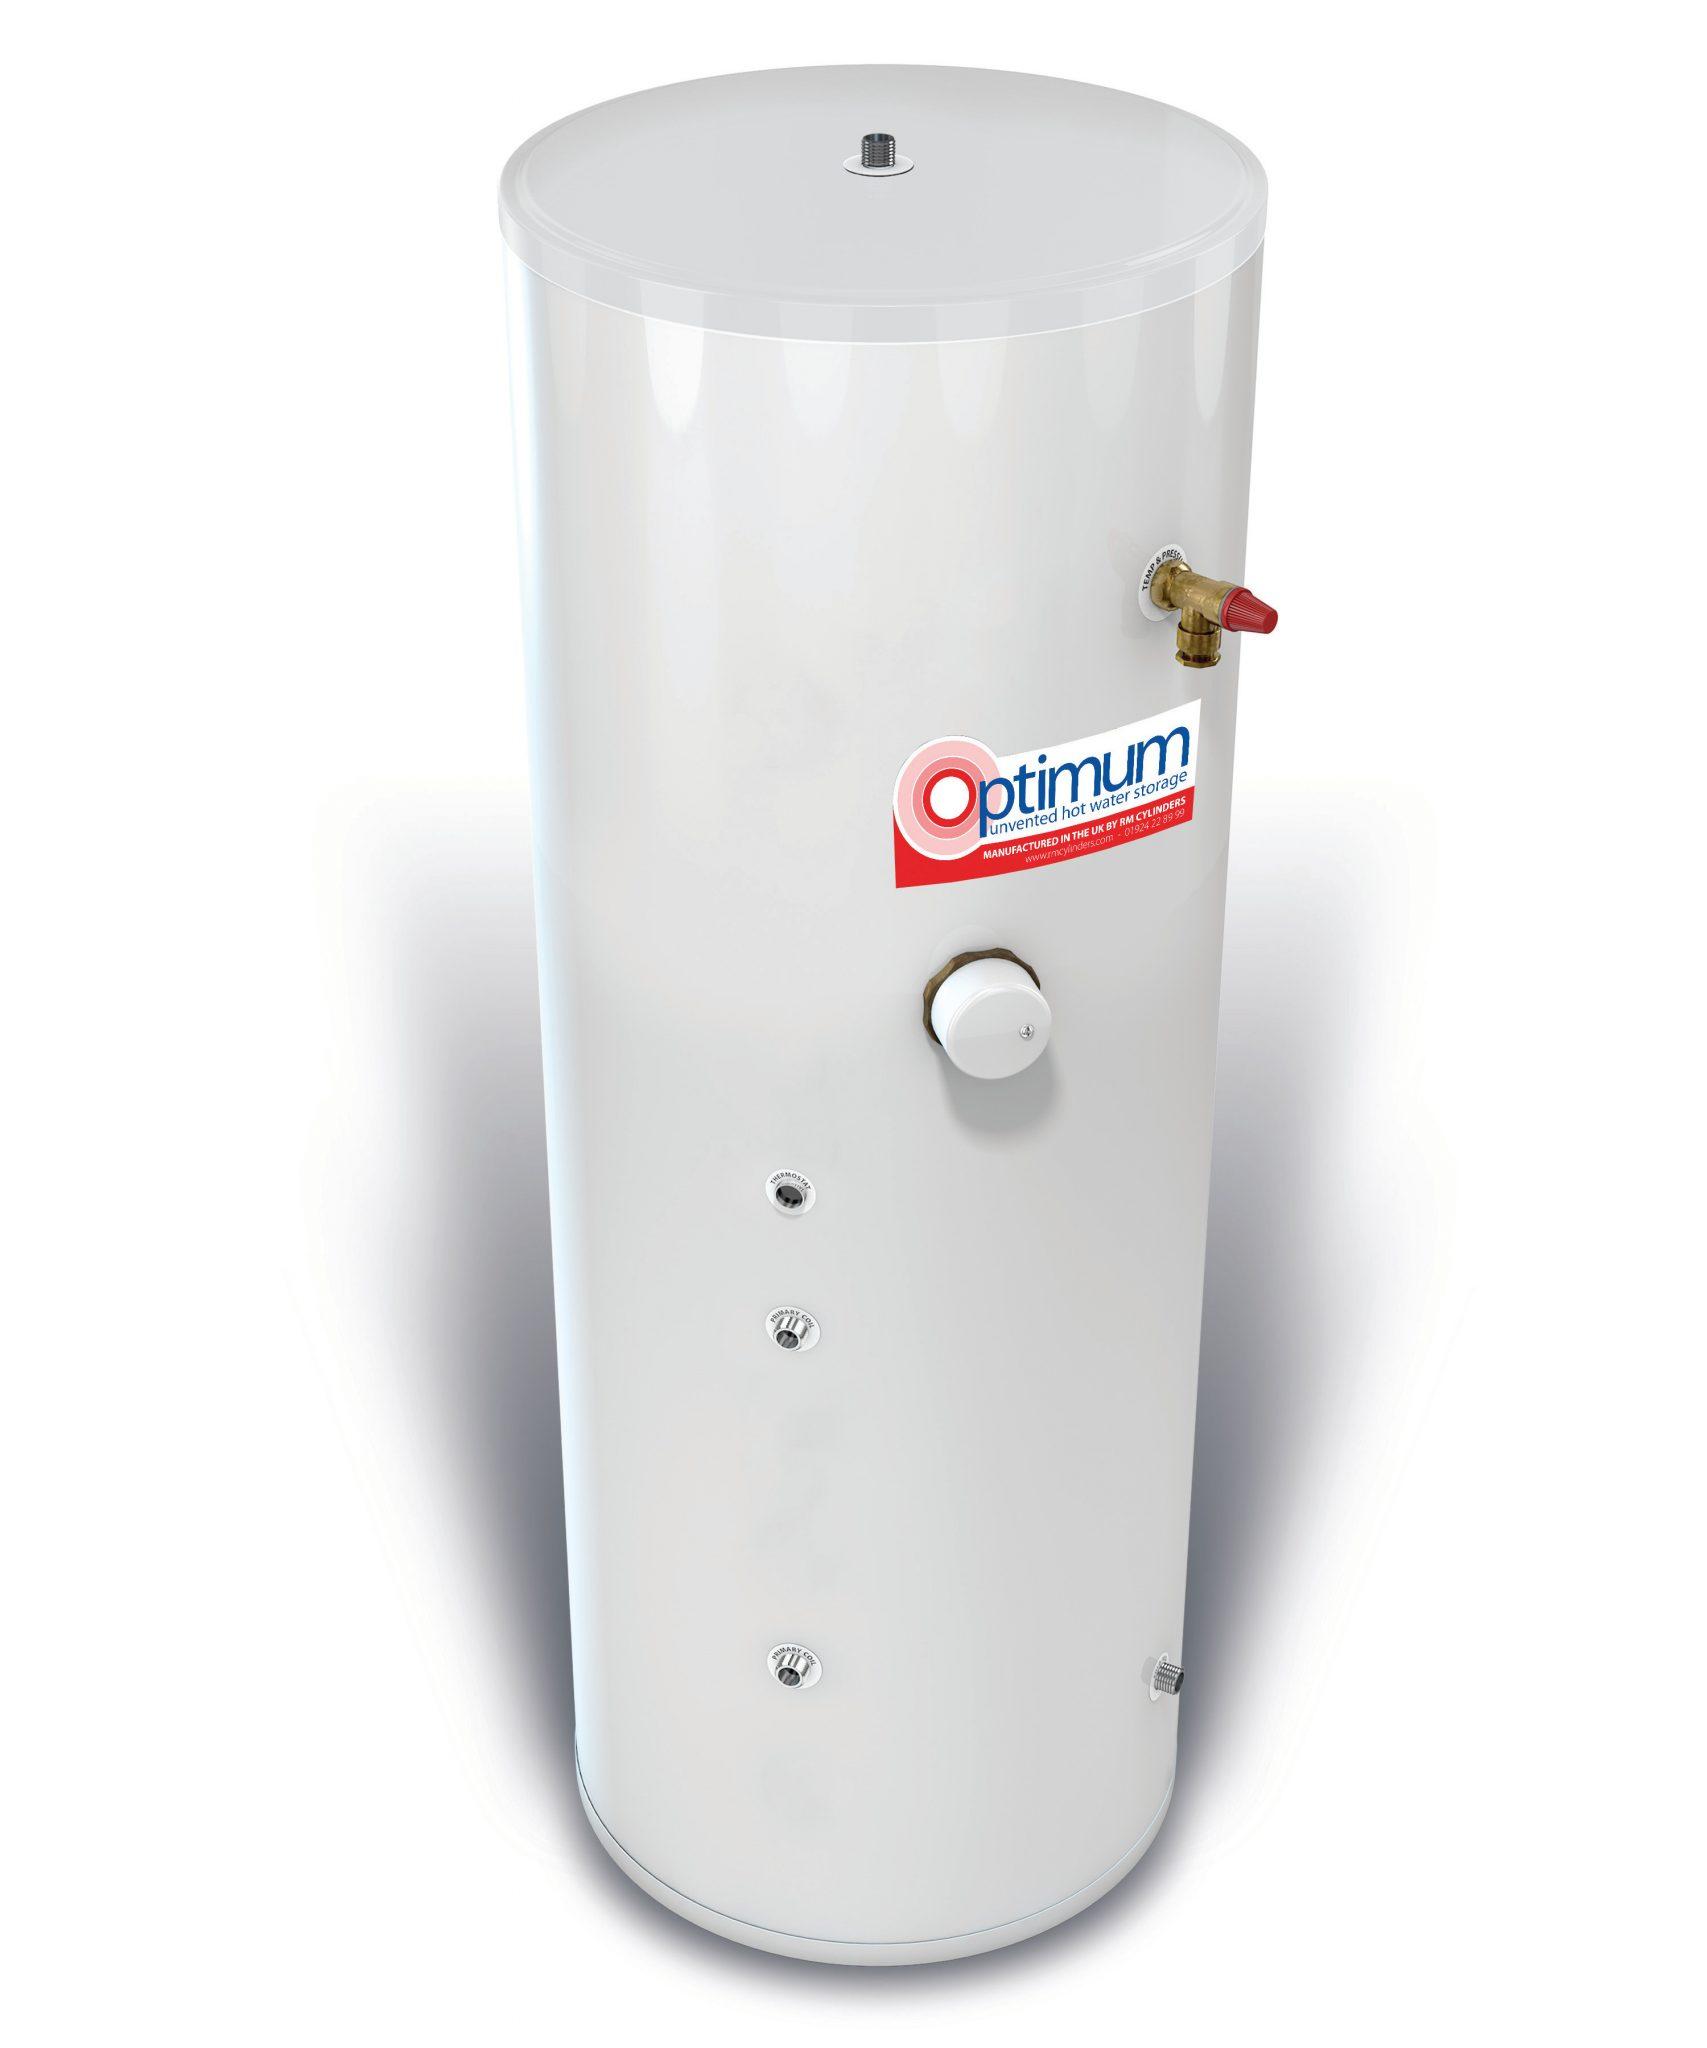 RM Optimum Unvented Indirect Cylinder - Installers Hub Online Shop